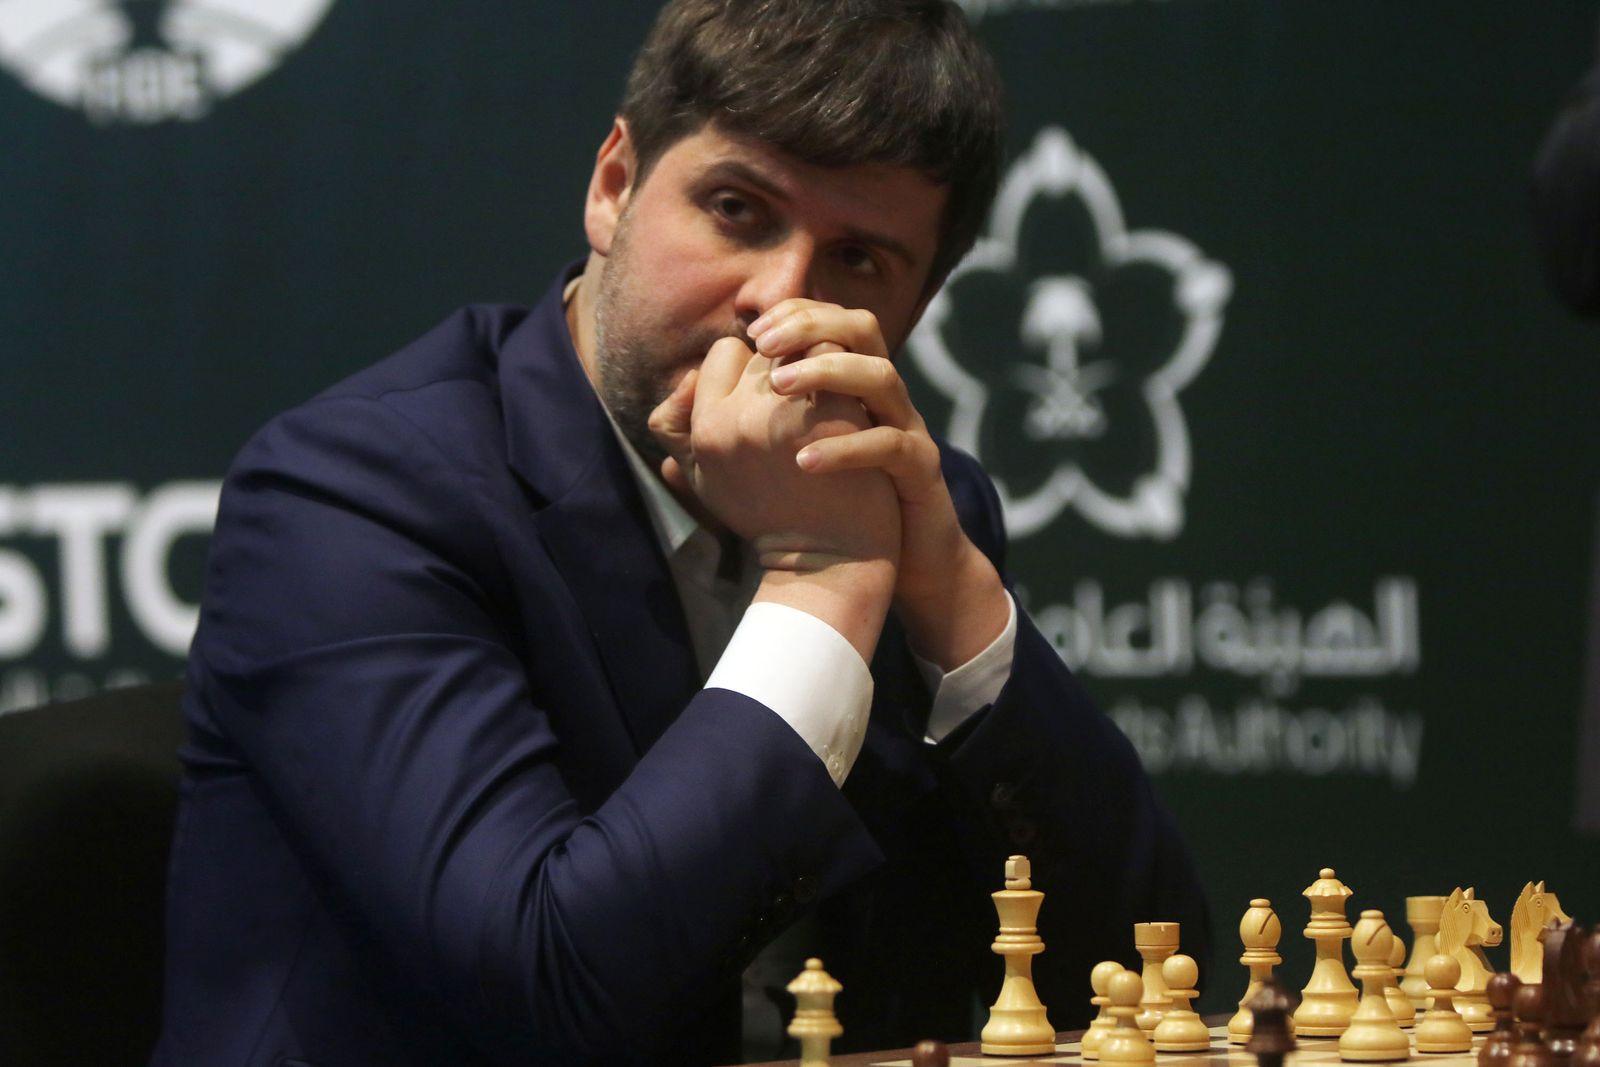 Schach/ Grenke Chess Classic/ Peter Svidler